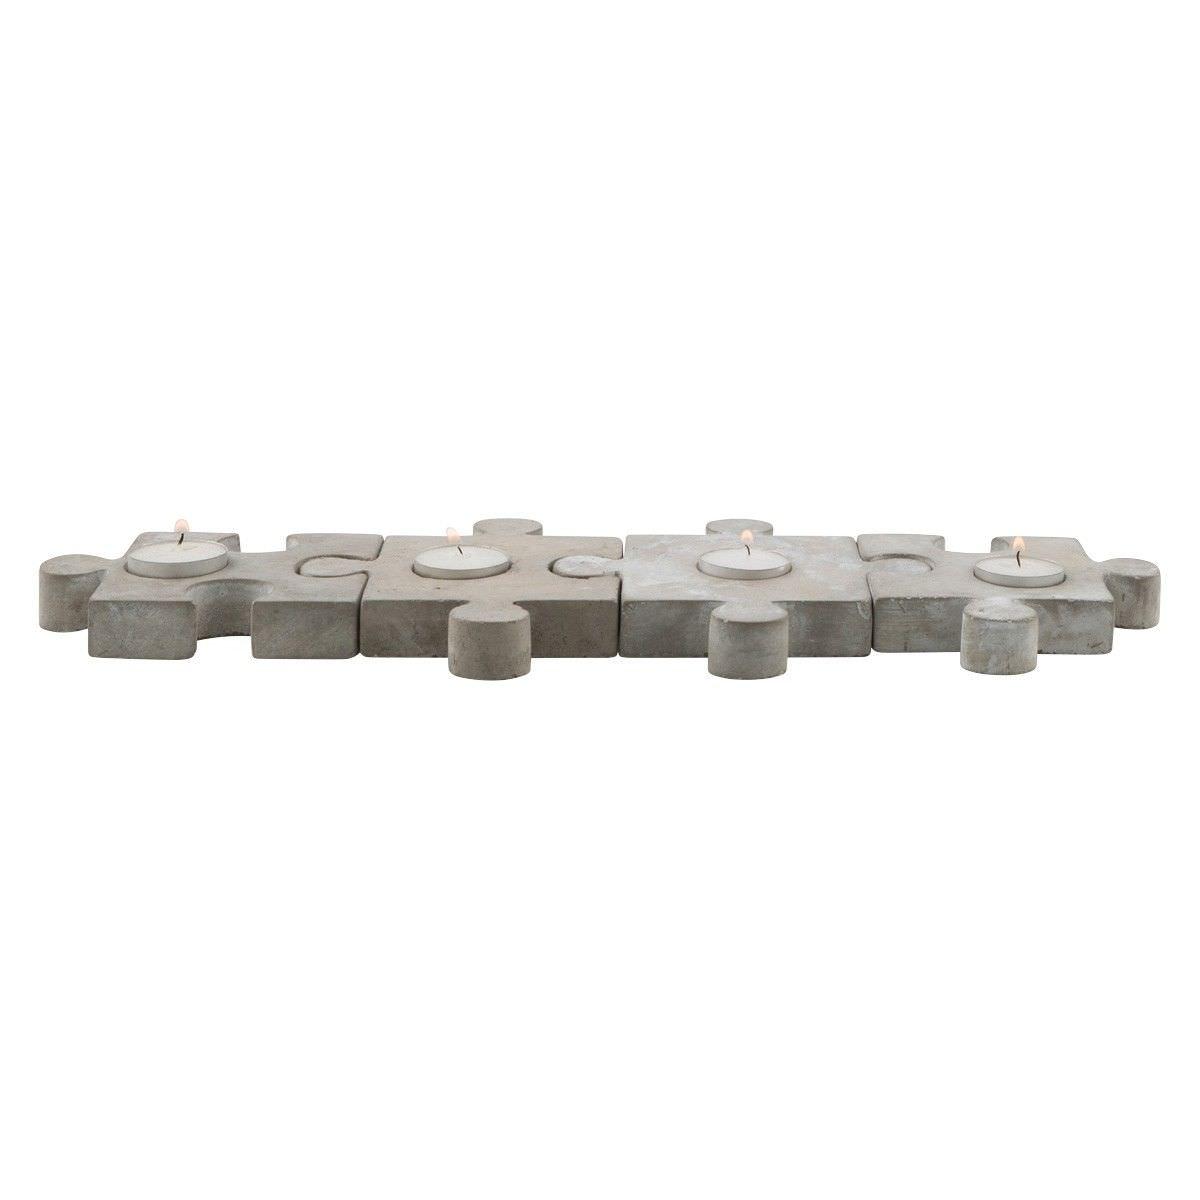 Kona 4 Piece Concrete Puzzle Tealight Holder Set, Raw Cement